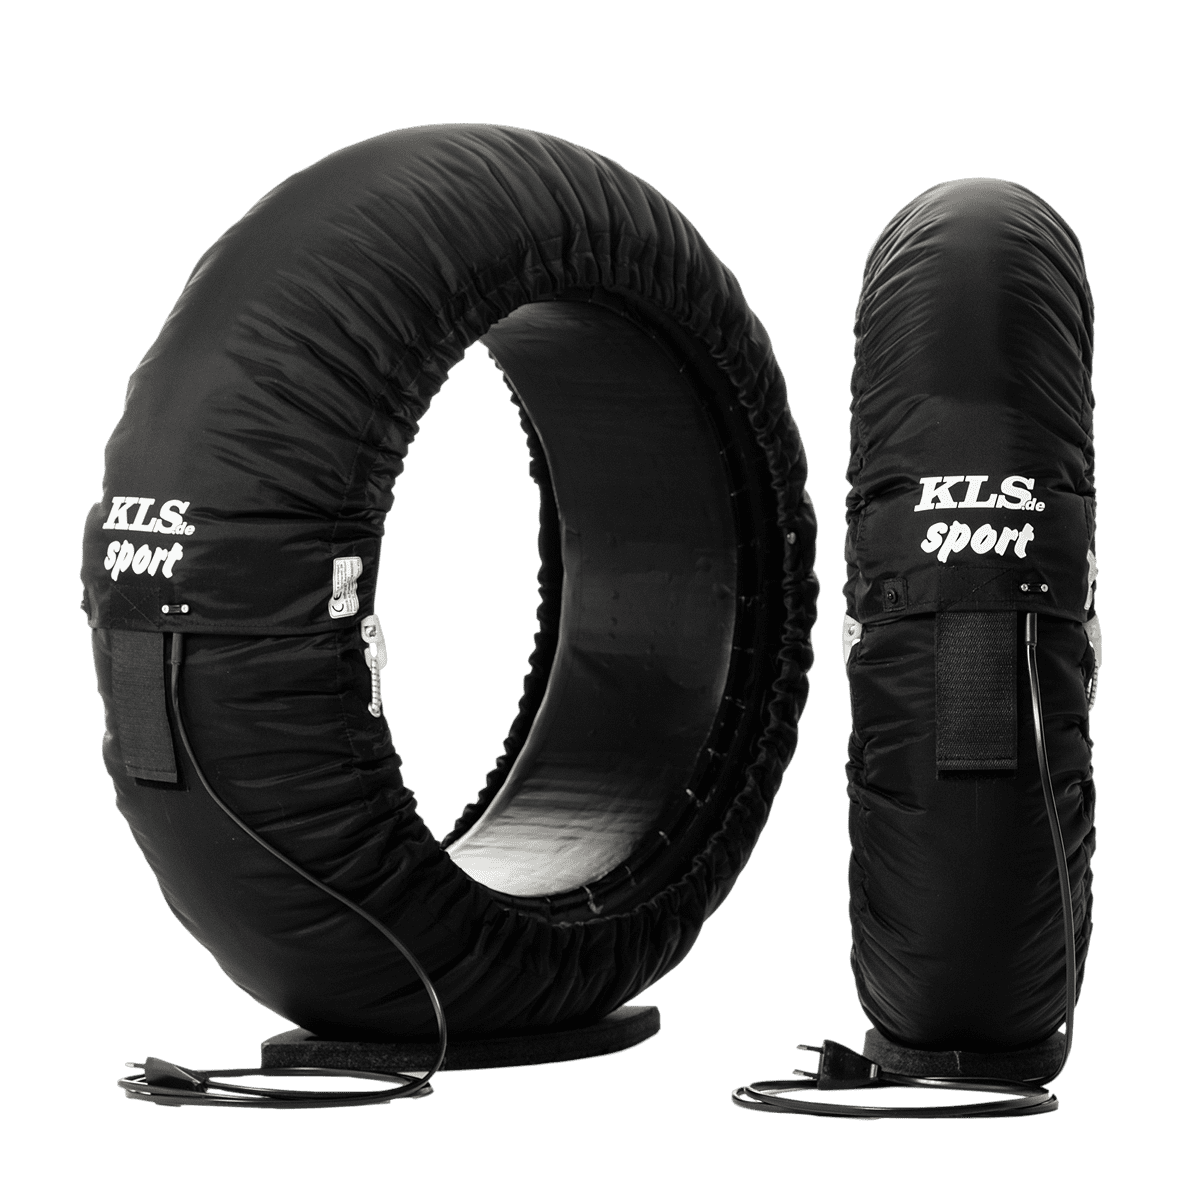 kls-reifenwaermer-moto-sport--1200x1200